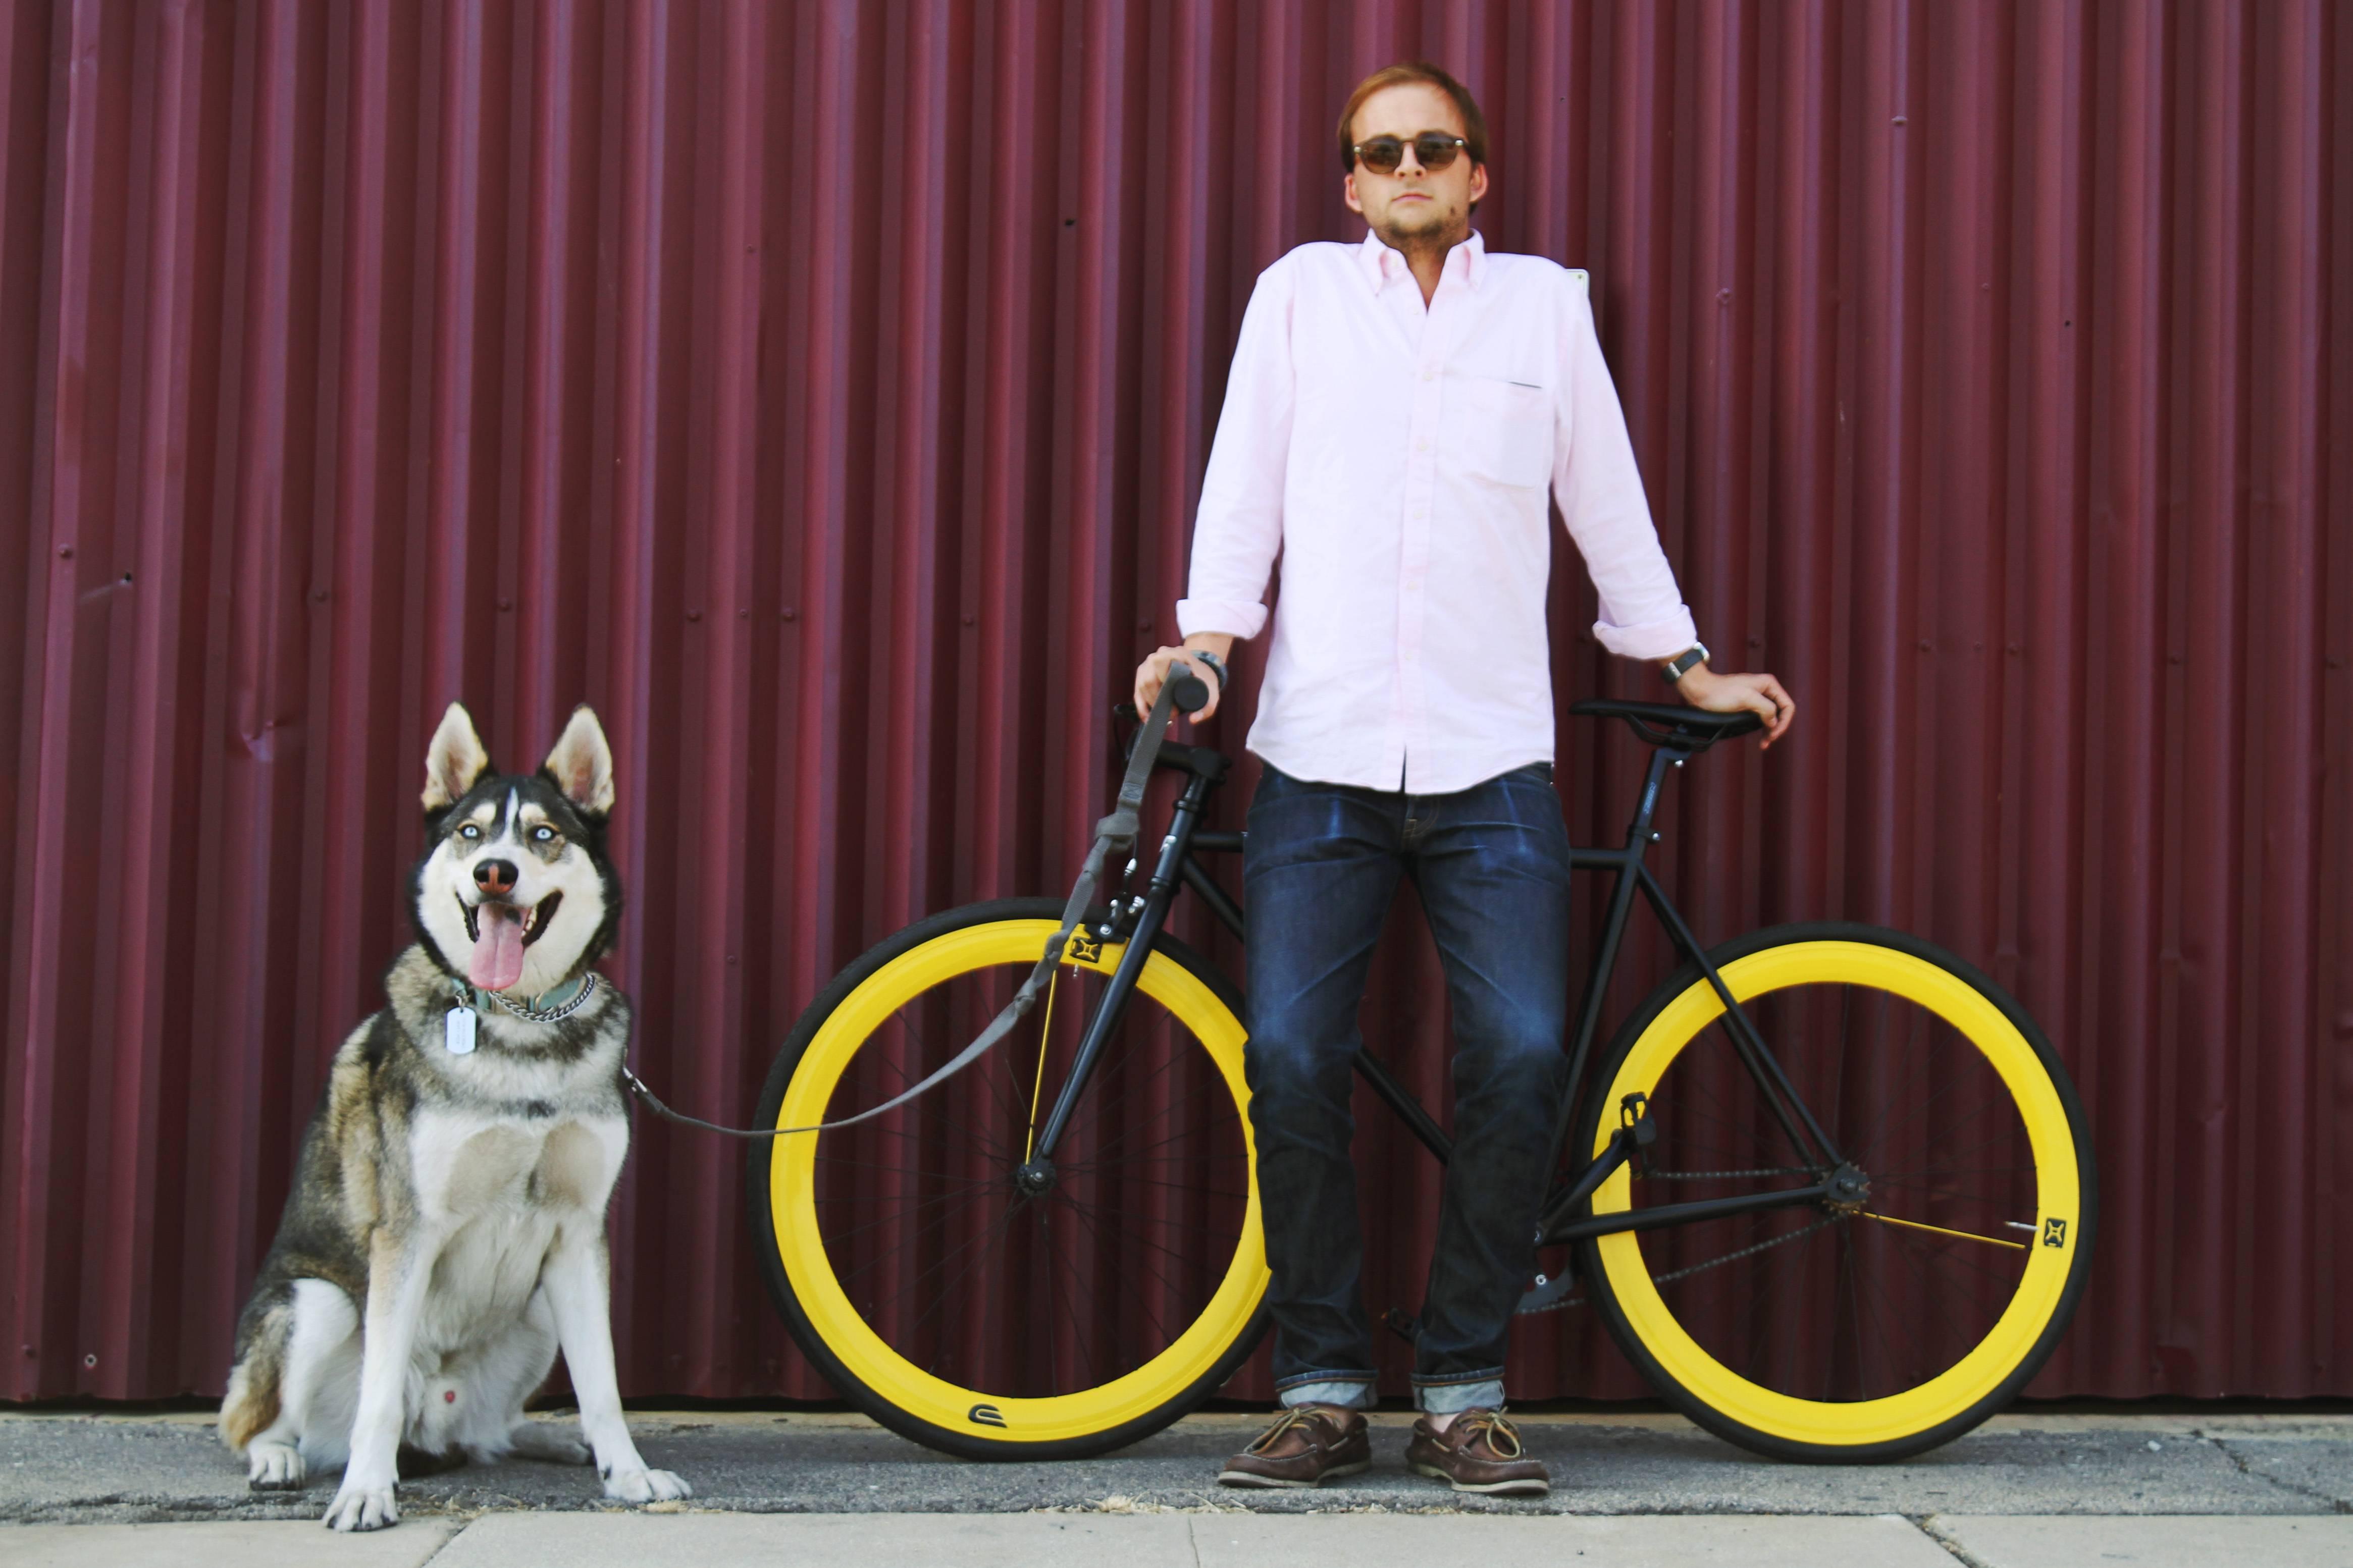 Jordan-Schau-CEO-of-Pure-Fix-Cycles-uses-analytics-tool-SumAll-.jpg